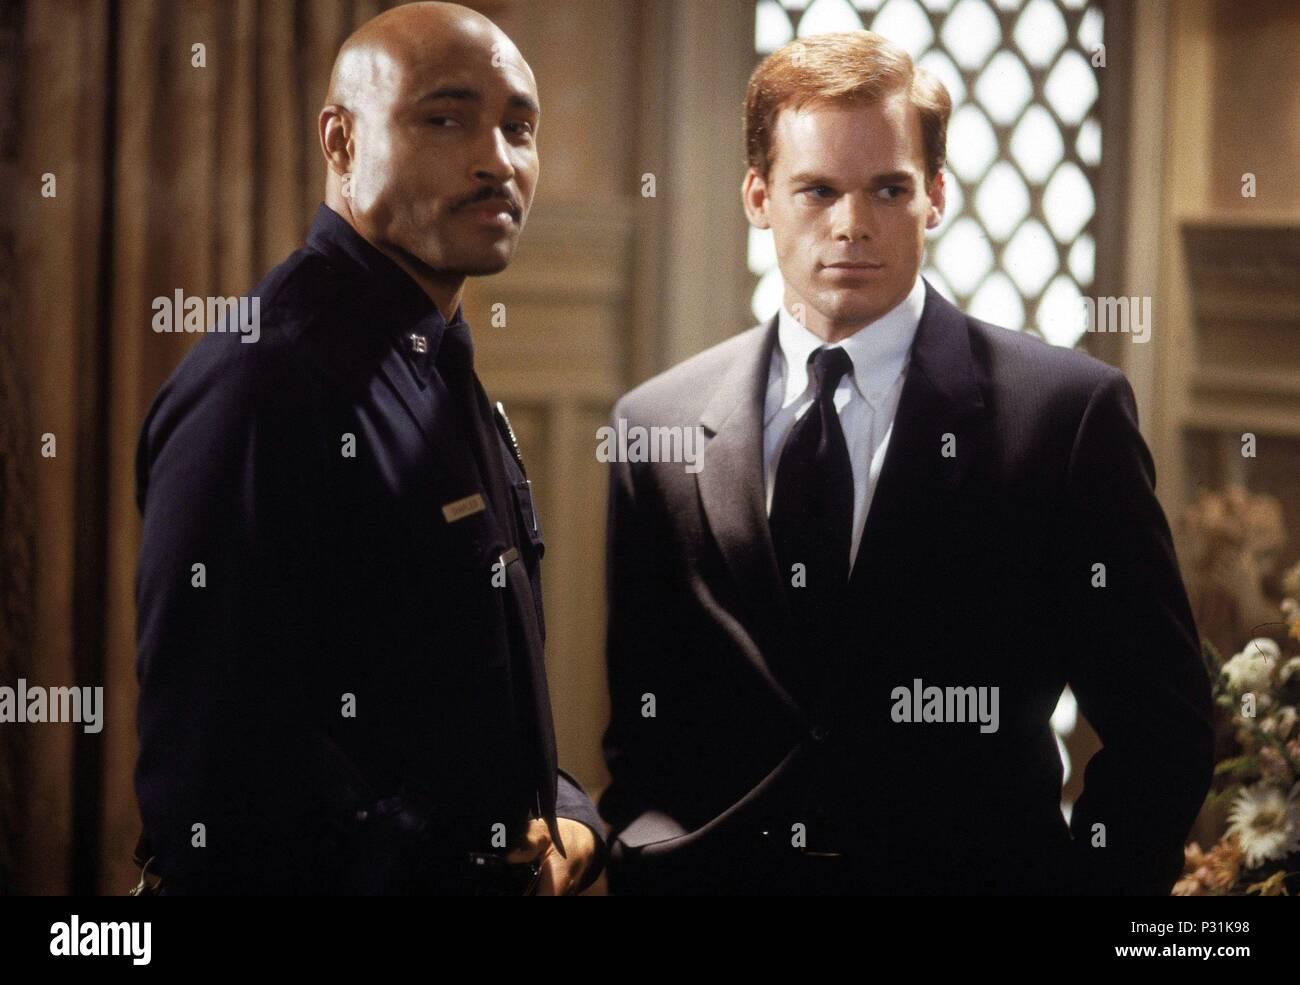 Description 4o Temporada Original Filmle Six Feet Under English Le Six Feet Under Year 2001 Stars Michael C Hall Matthew St Patrick